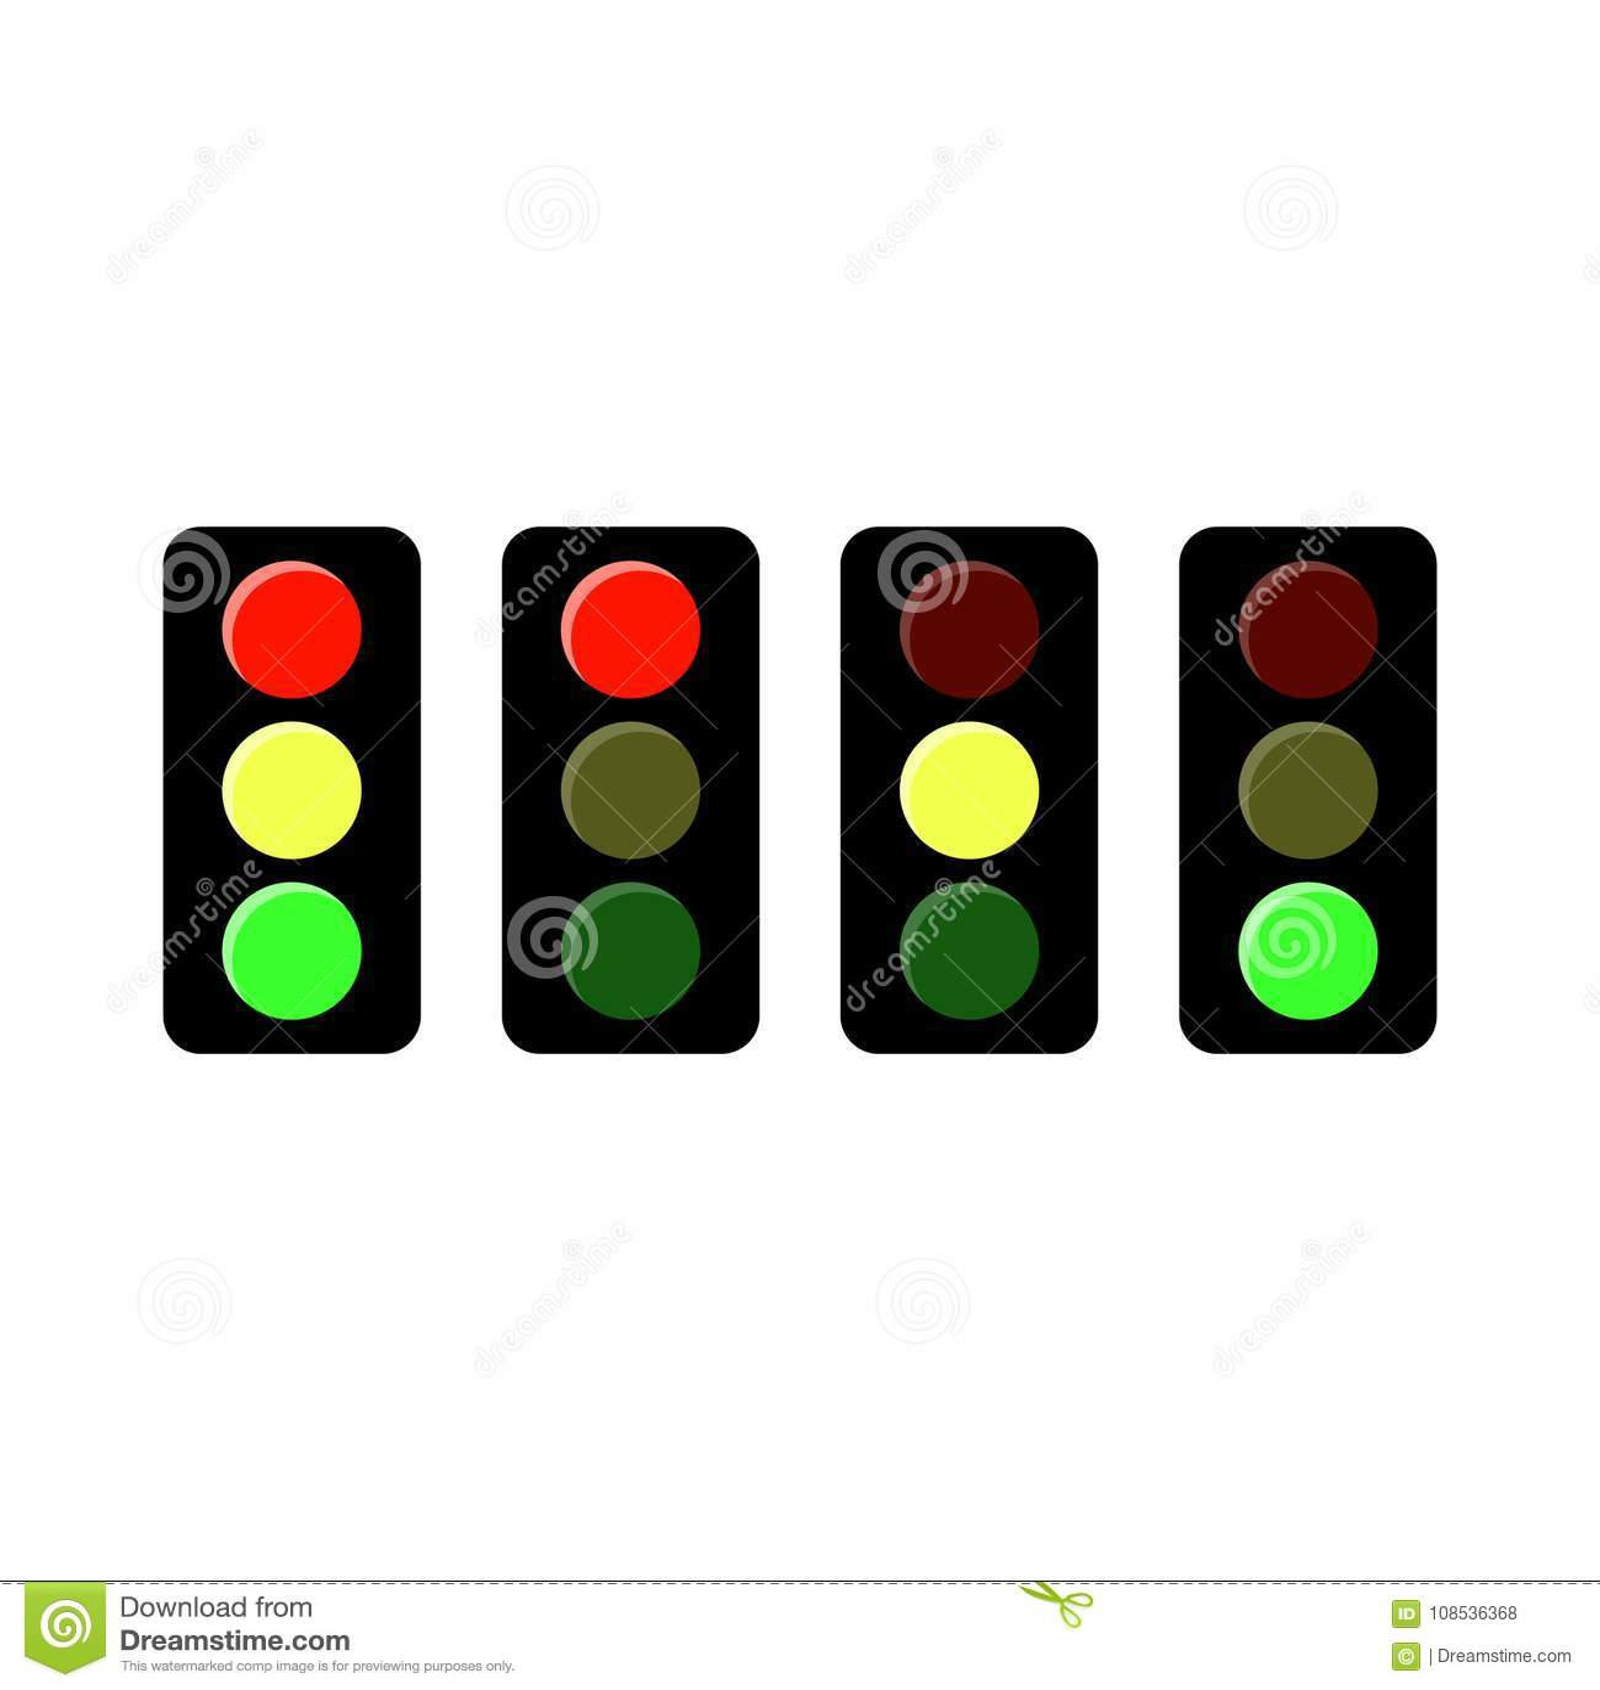 Traffic Light Icon. Three Frame Animation. Stock Vector